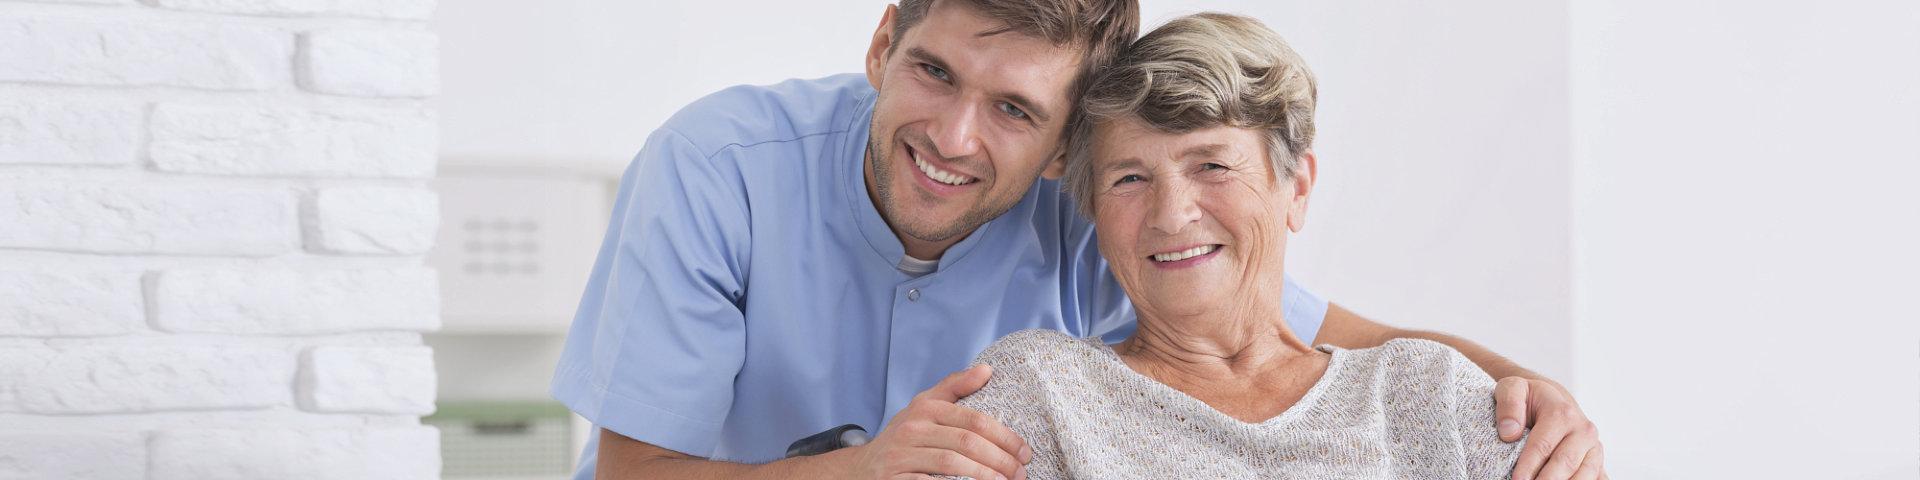 Male nurse hugging his senior woman patient